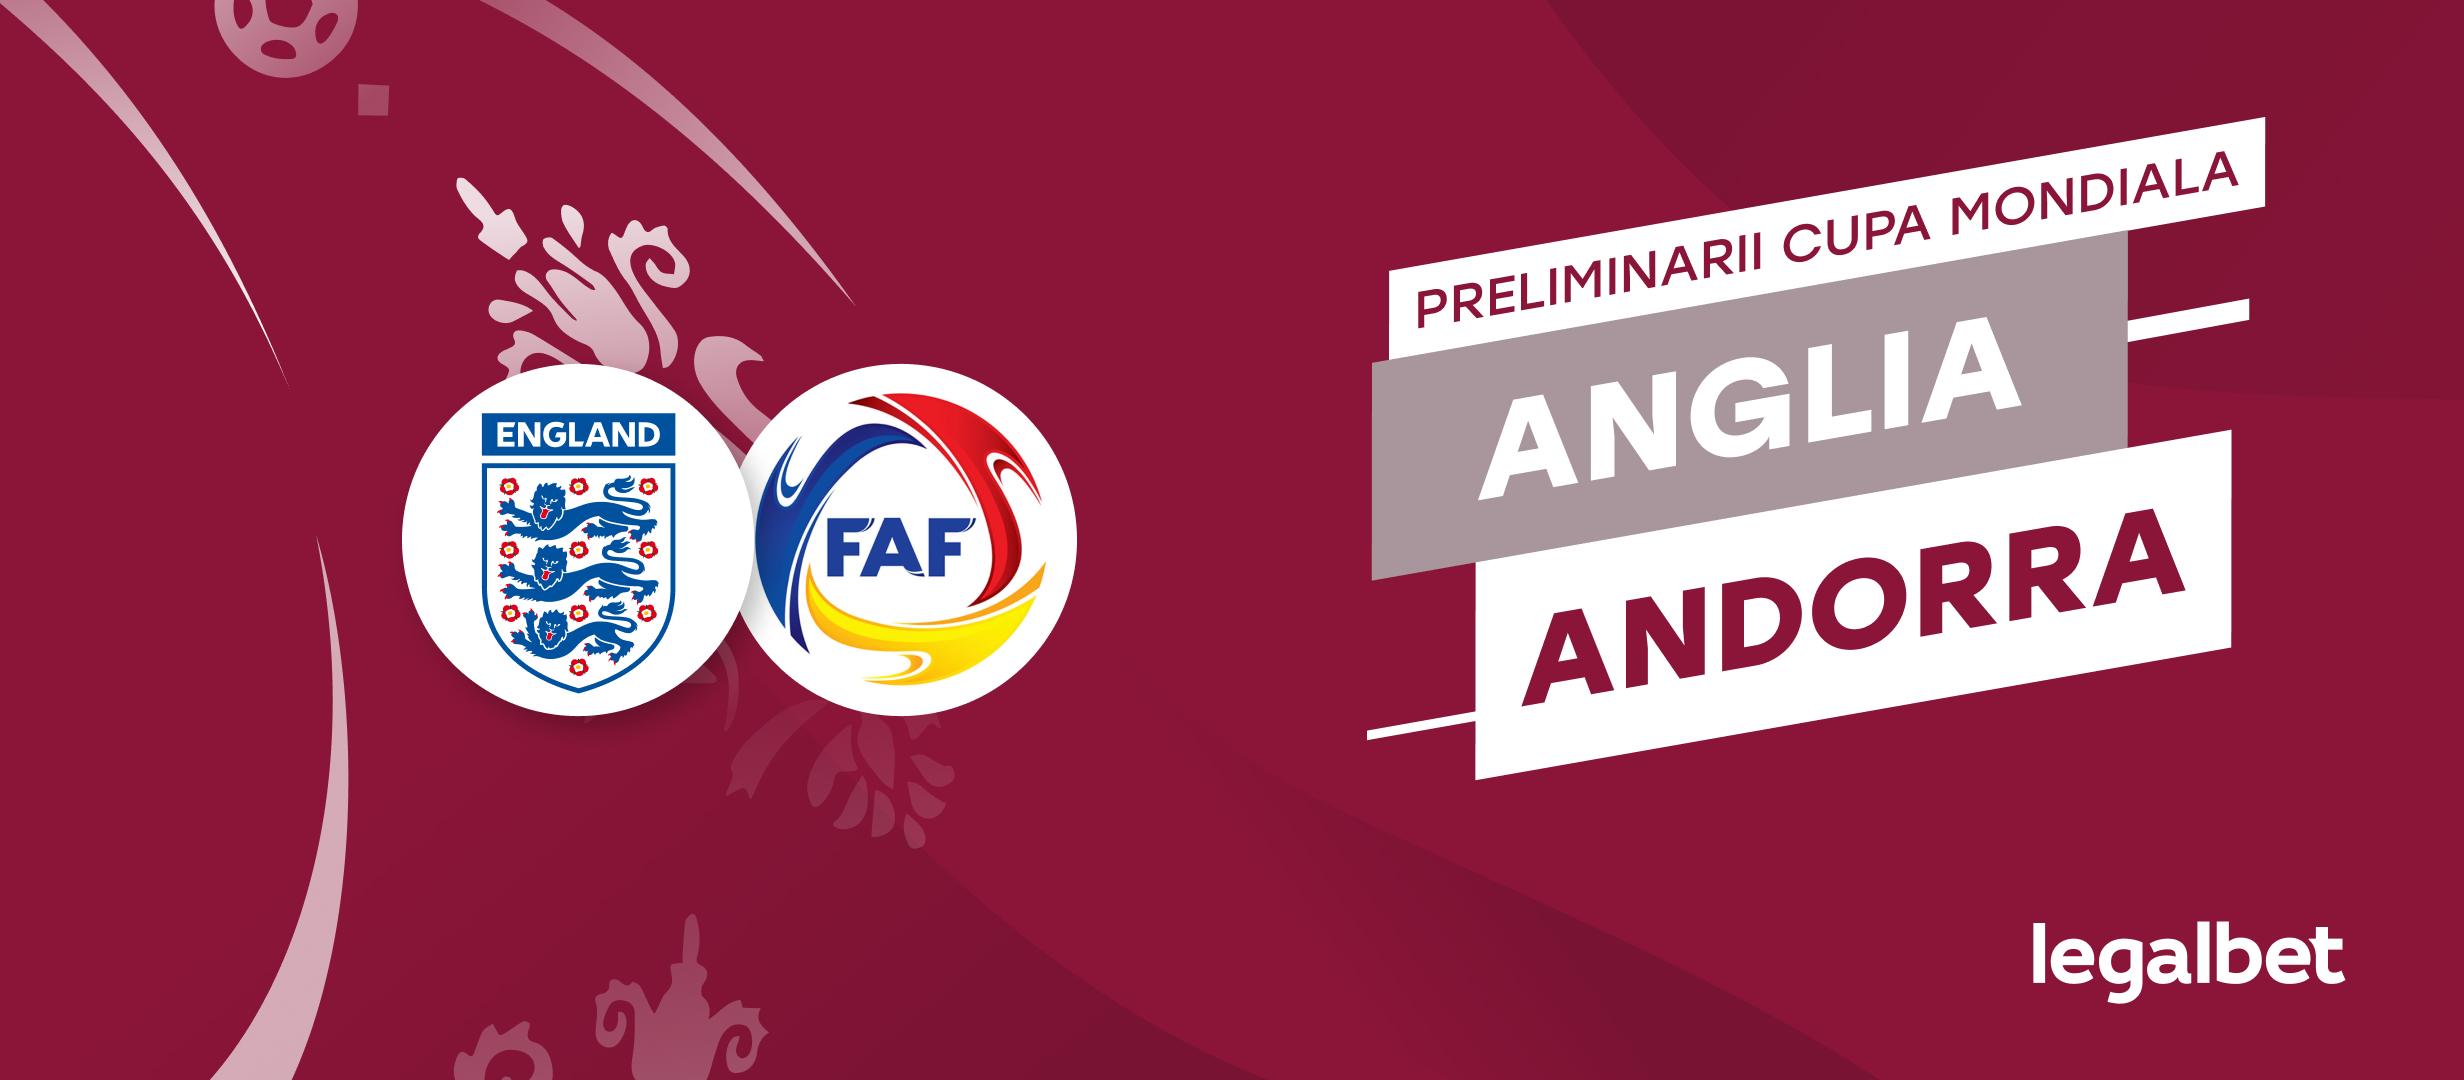 Anglia - Andorra, ponturi preliminarii CM 2022